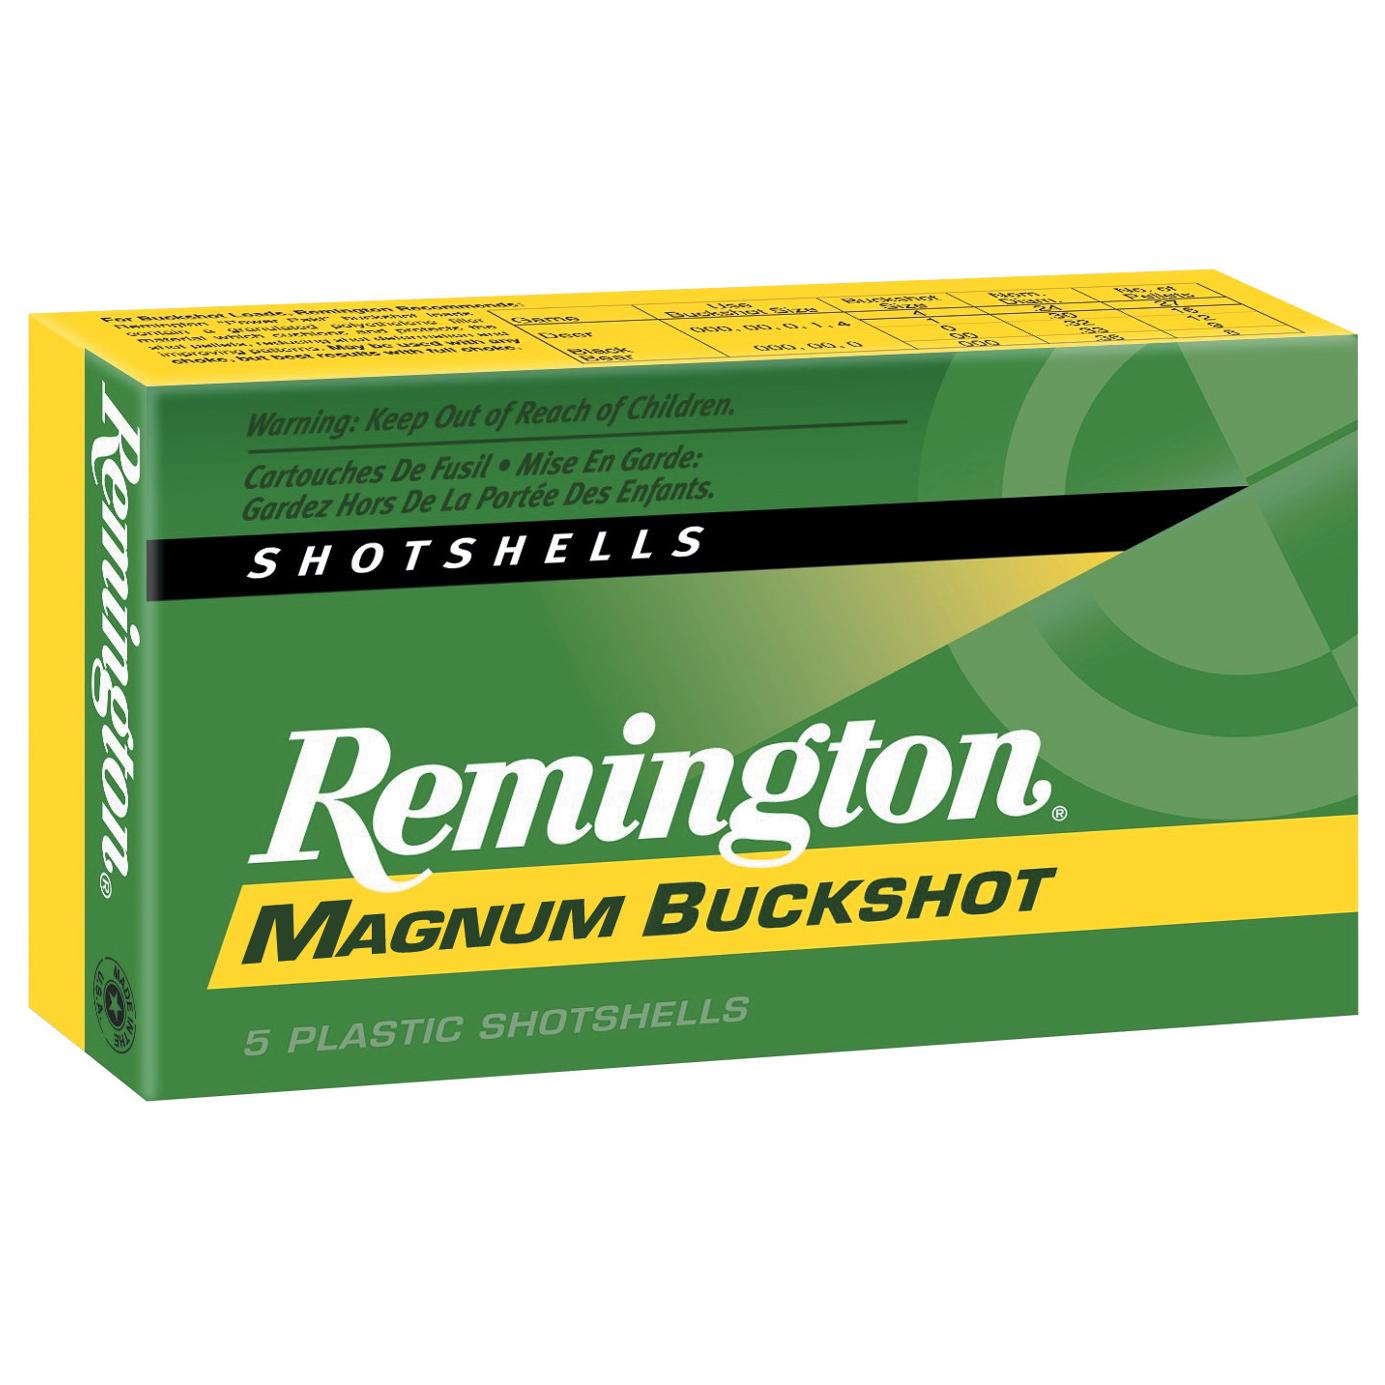 Remington Express Magnum Buckshot, 12-ga, 3″, 41 Pellets